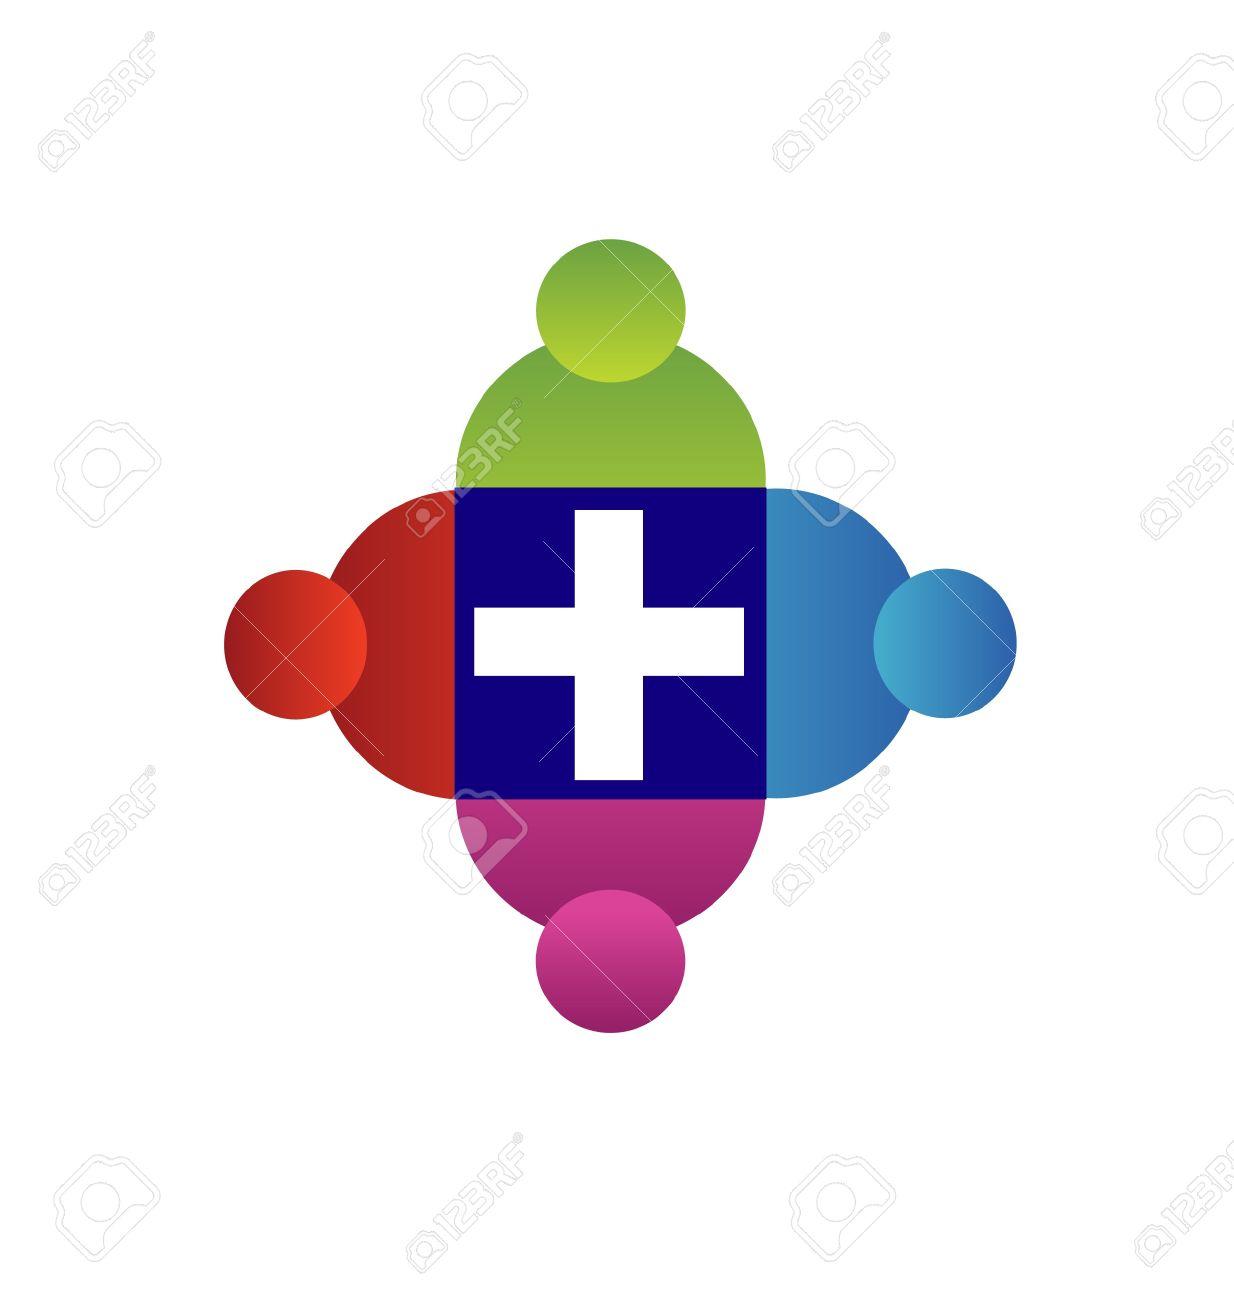 Teamwork with a cross logo Stock Vector - 18150308